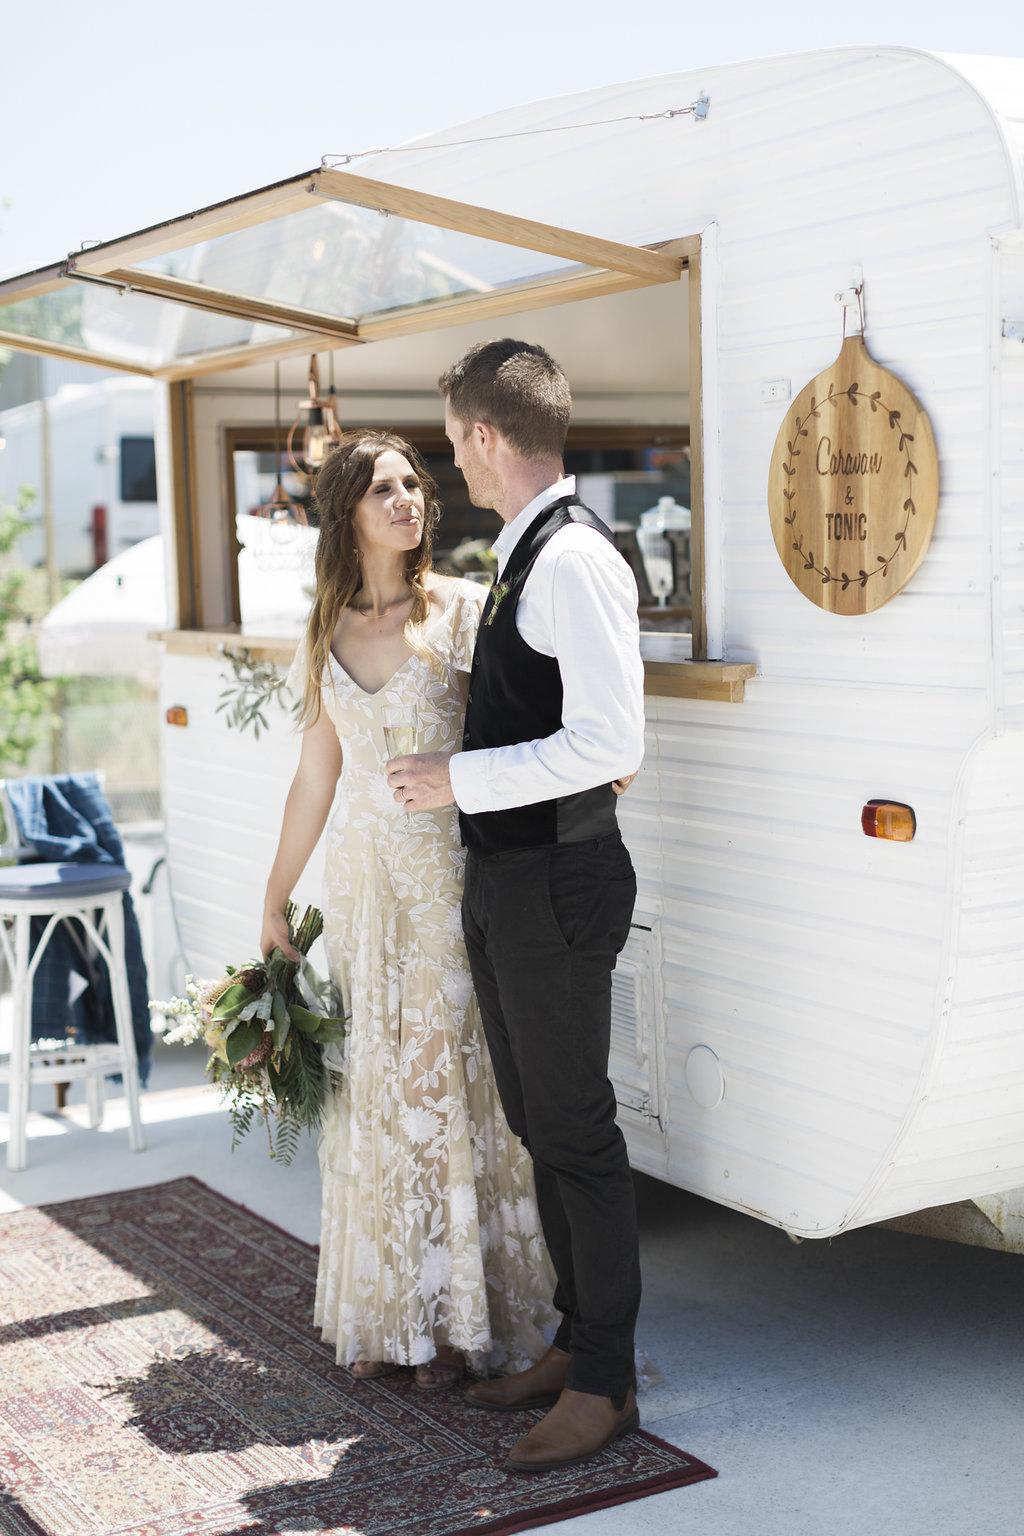 Wedding feels